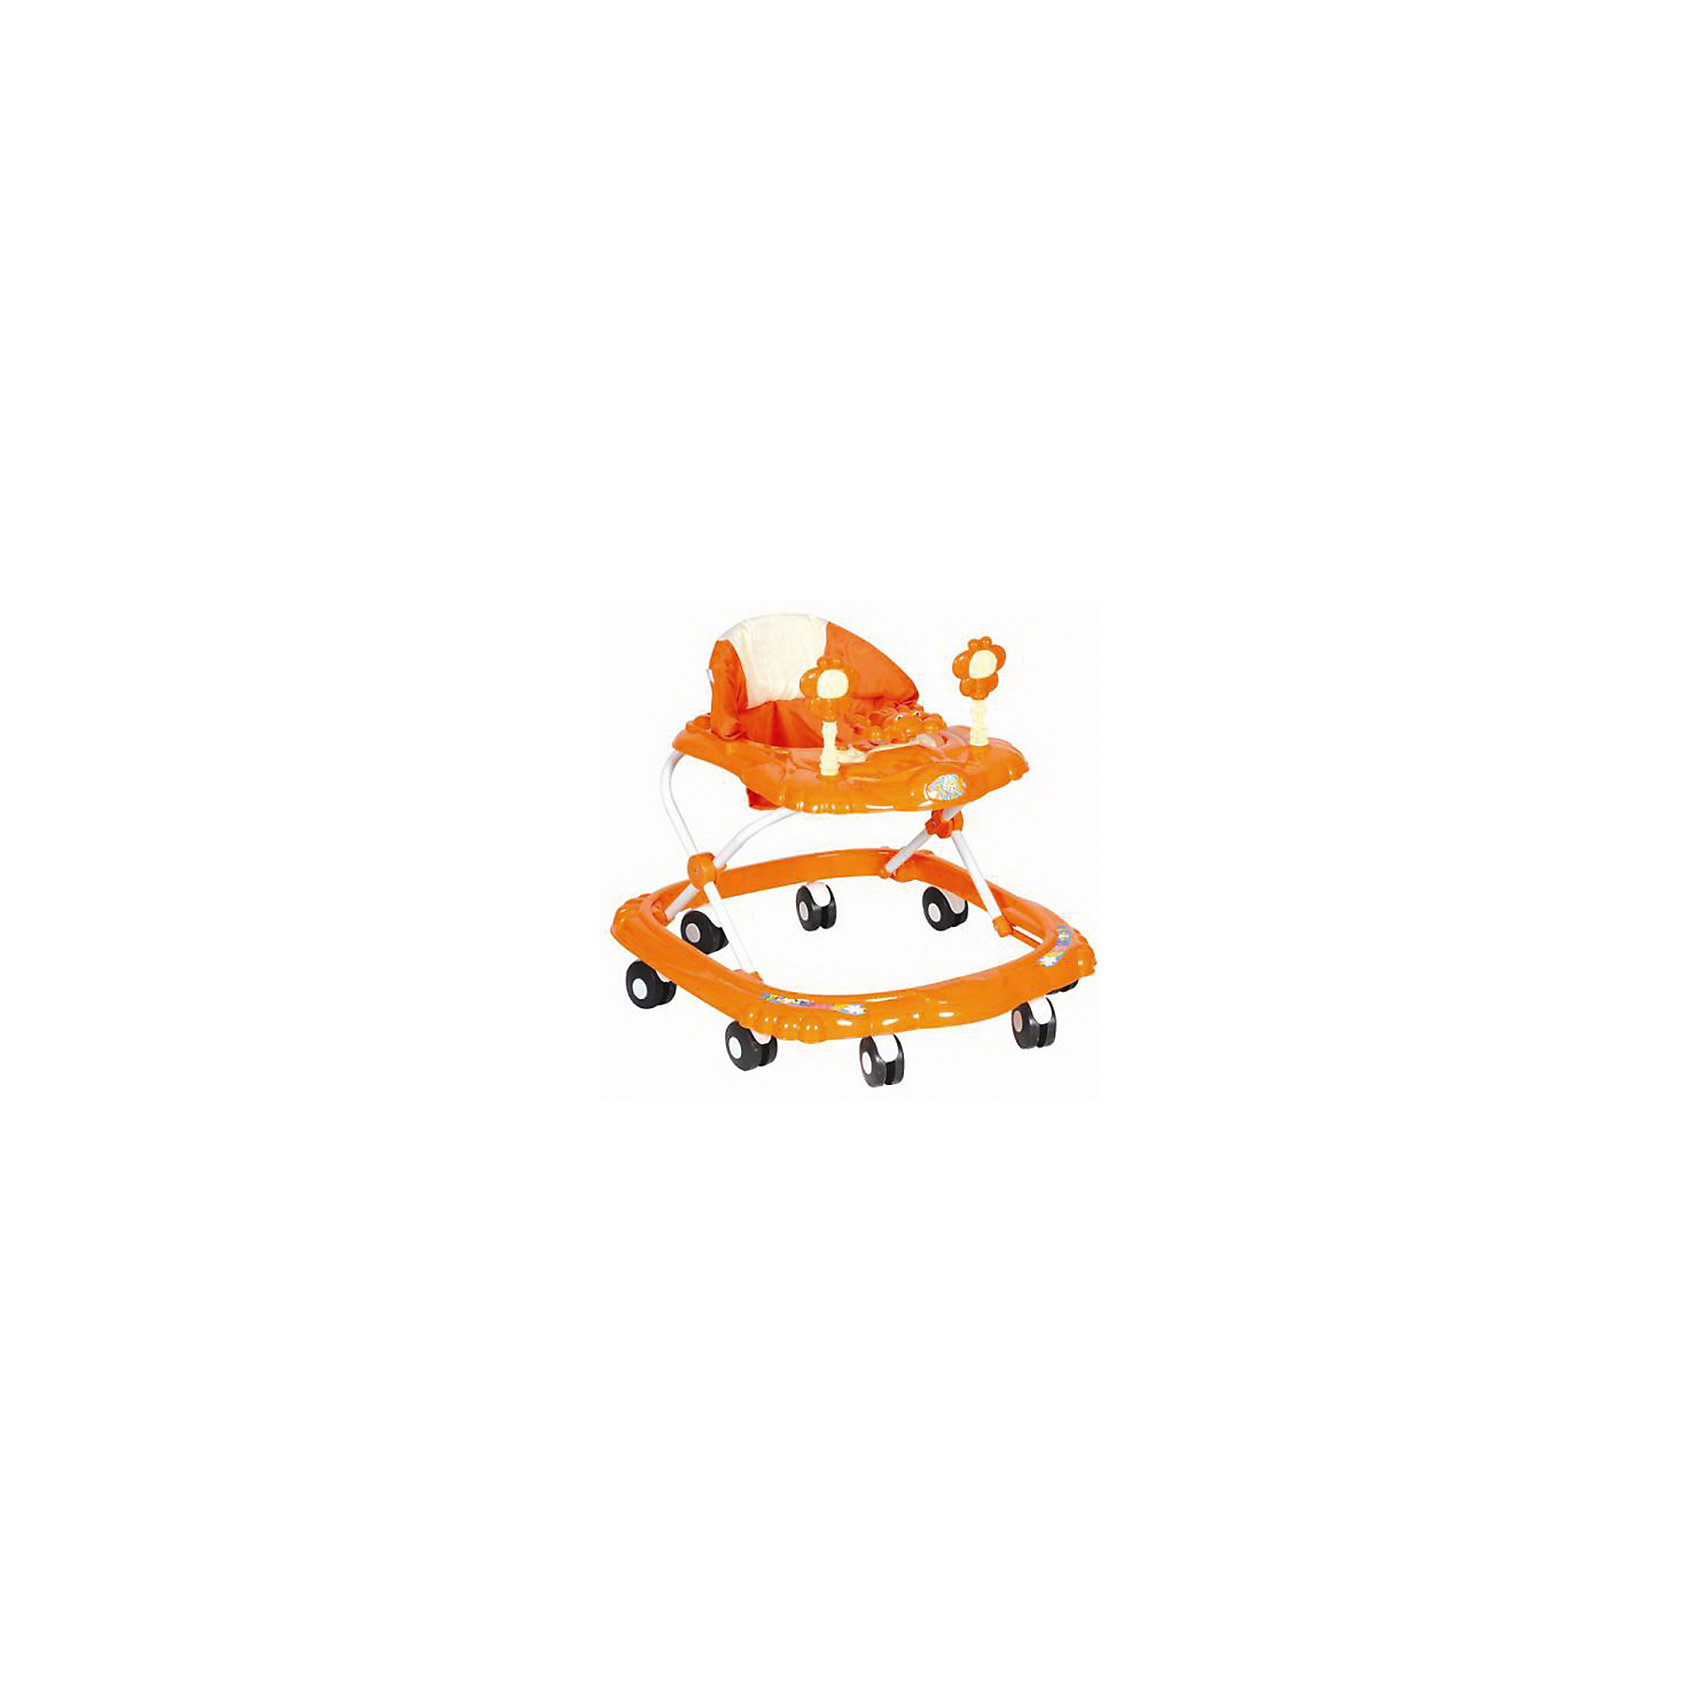 Ходунки Цветочки, Shine Ring, оранжевыйХодунки<br>SHINE RING  Ходунки (8 колес,игрушки,муз) 6 шт в кор.(66*56*47), ORANGE/ Оранжевый<br><br>Ширина мм: 670<br>Глубина мм: 600<br>Высота мм: 520<br>Вес г: 2800<br>Возраст от месяцев: 6<br>Возраст до месяцев: 12<br>Пол: Унисекс<br>Возраст: Детский<br>SKU: 5559223